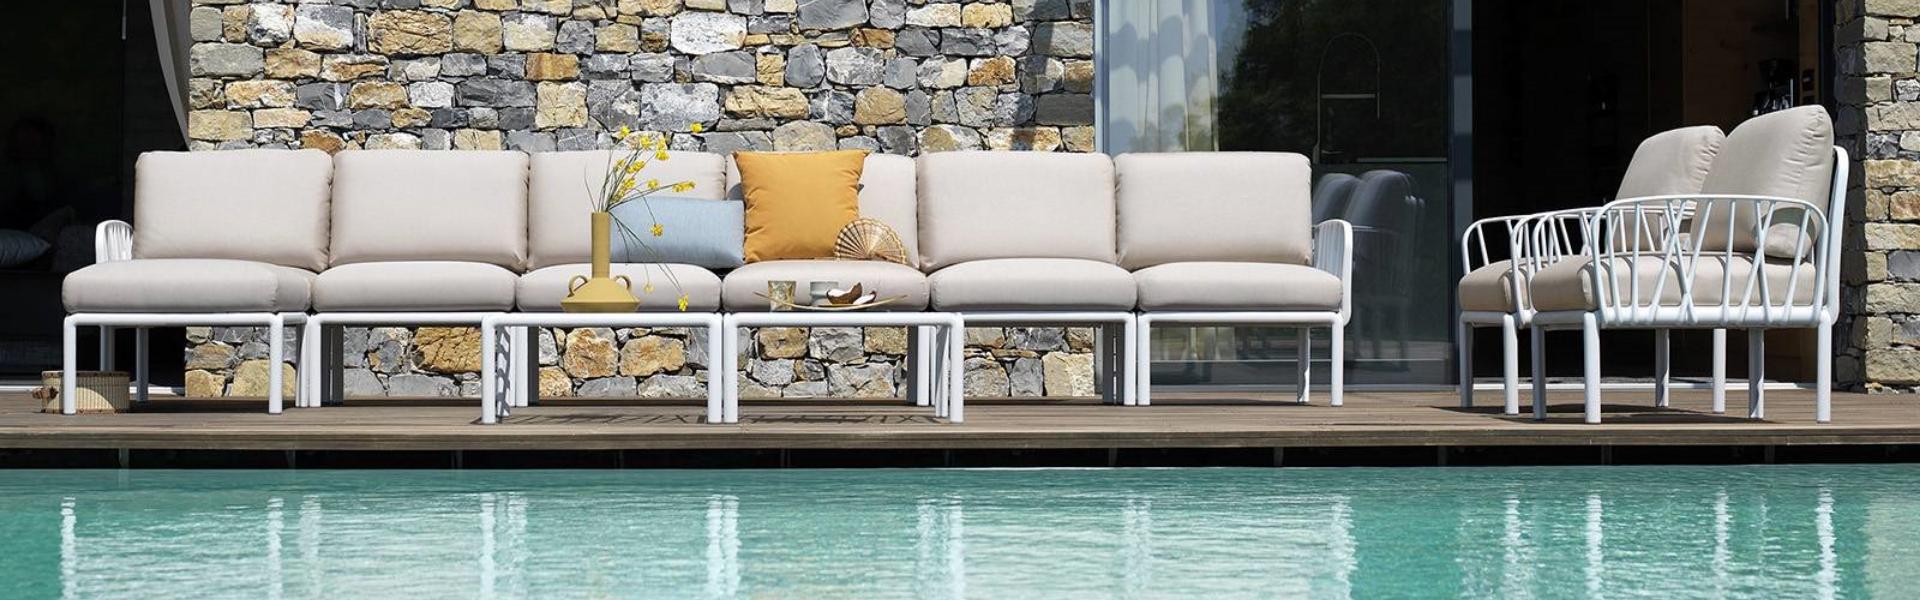 nardi outdoor furniture patio chairs